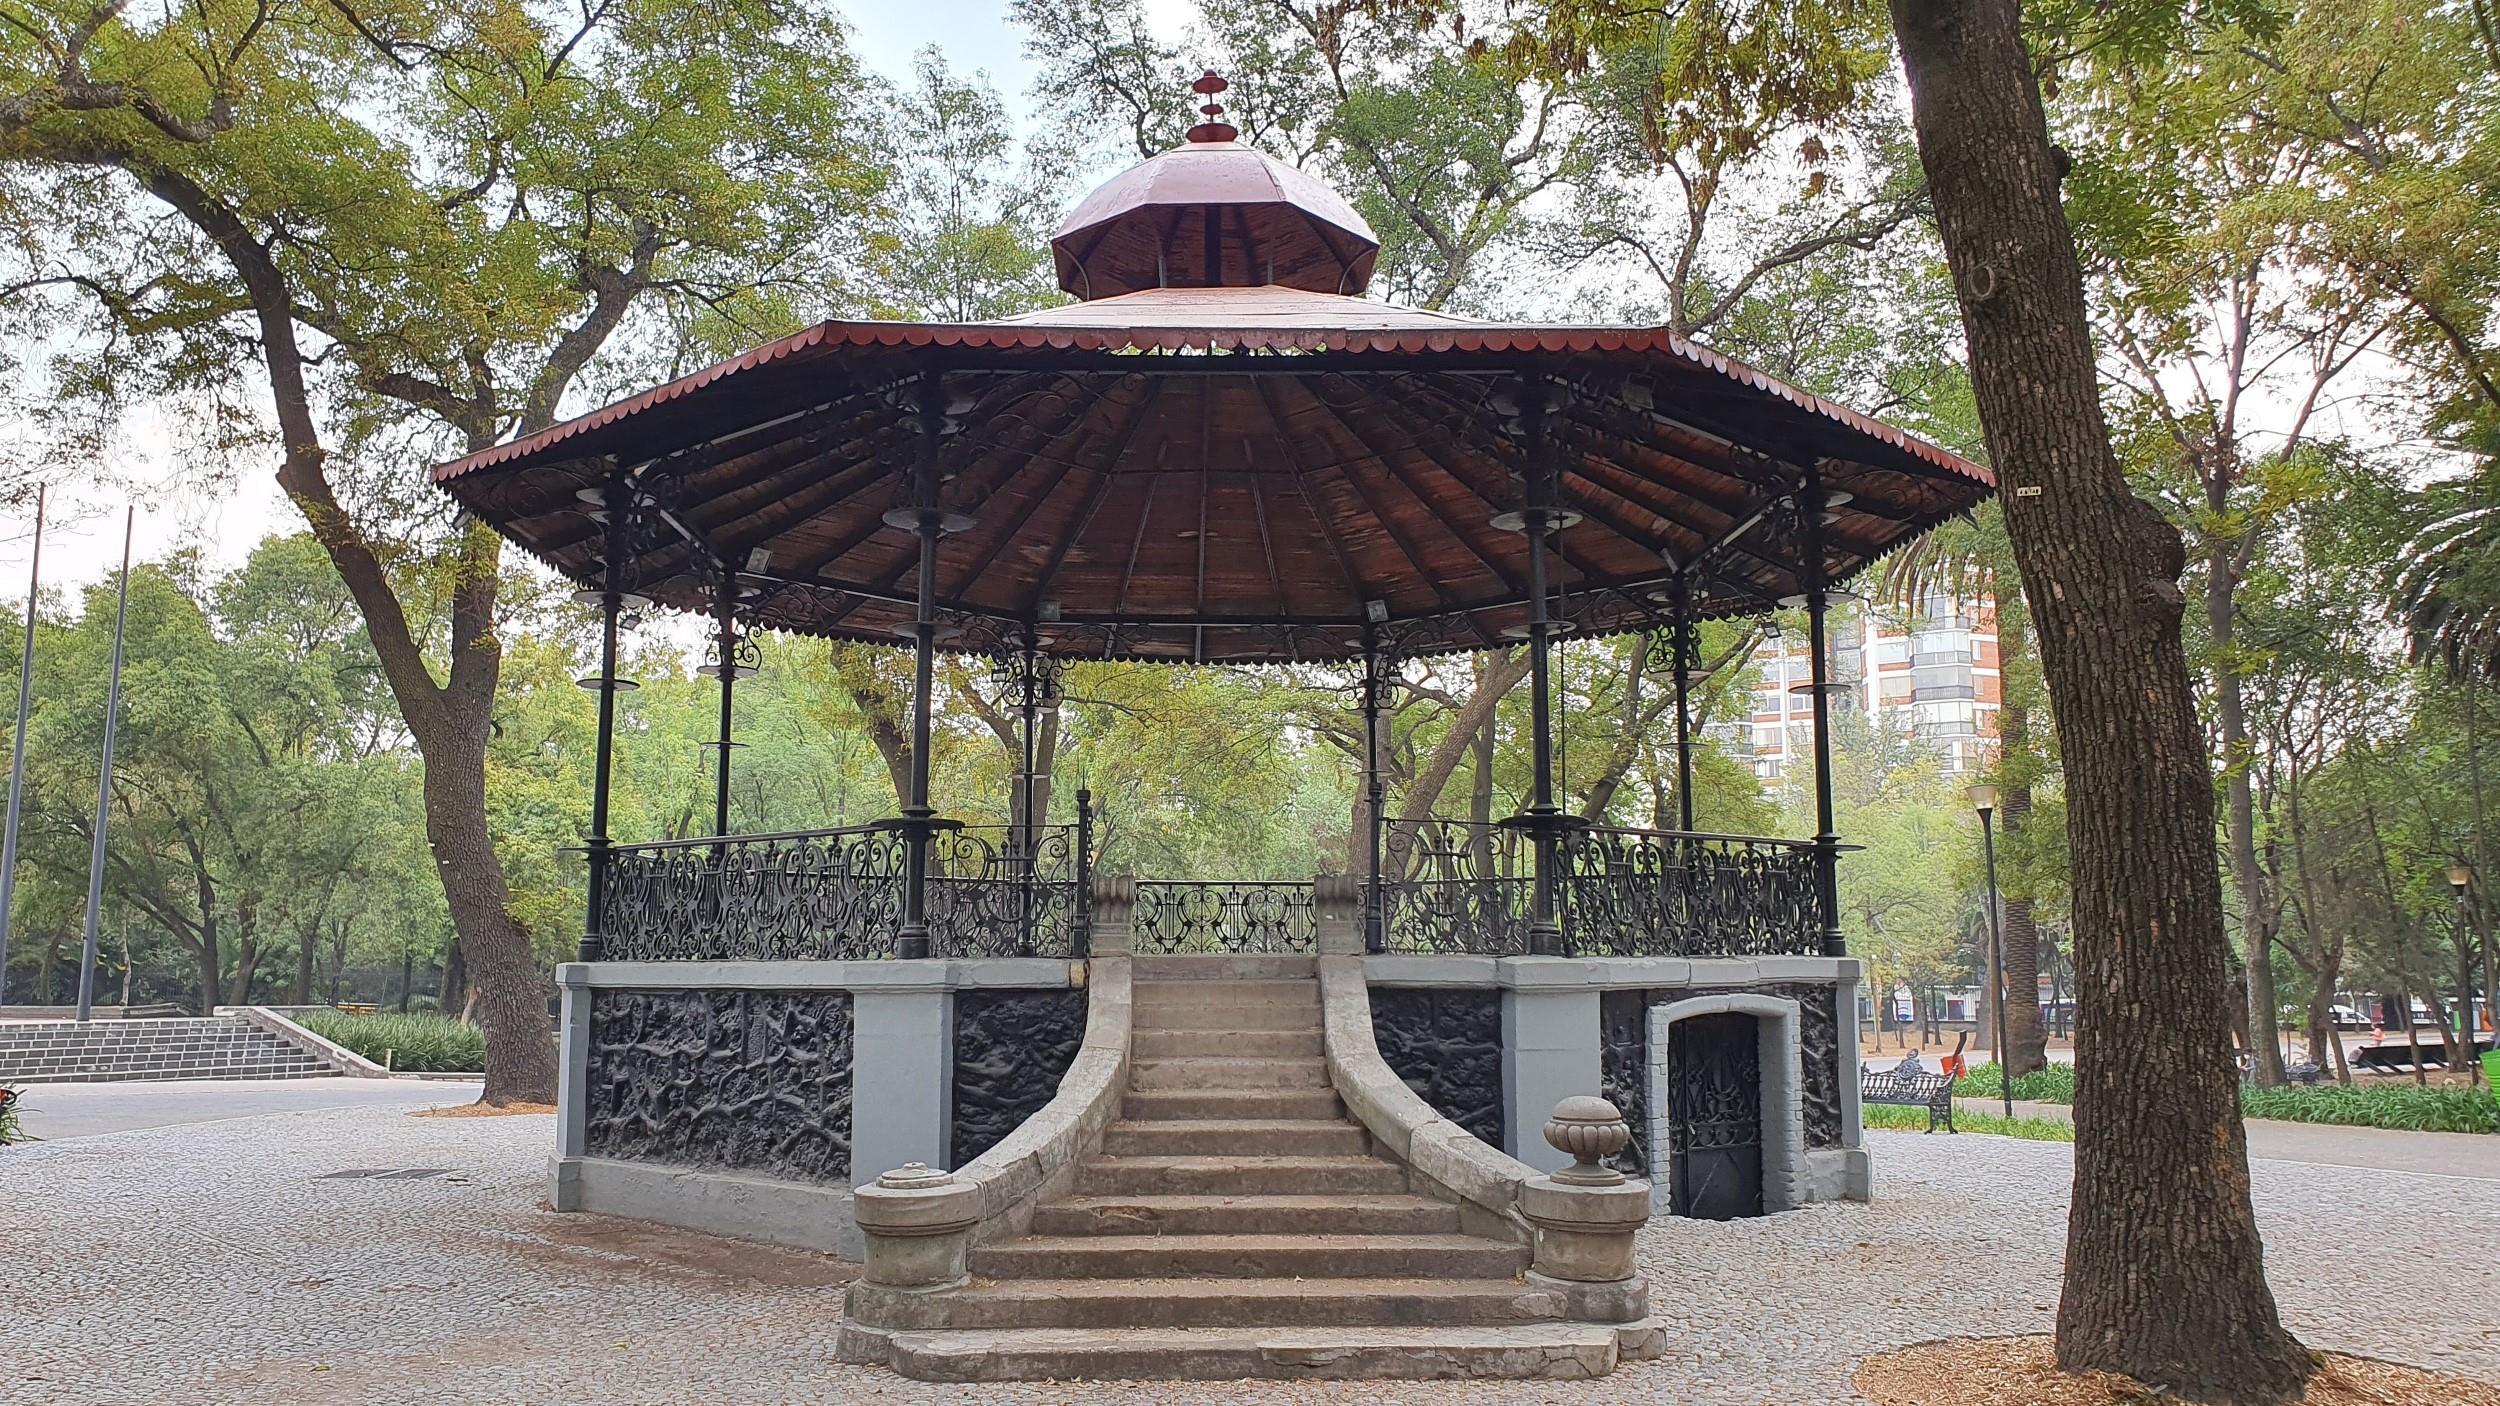 Free-Walking-Tour-of-Chapultepec-Park,-Mexico-City-4